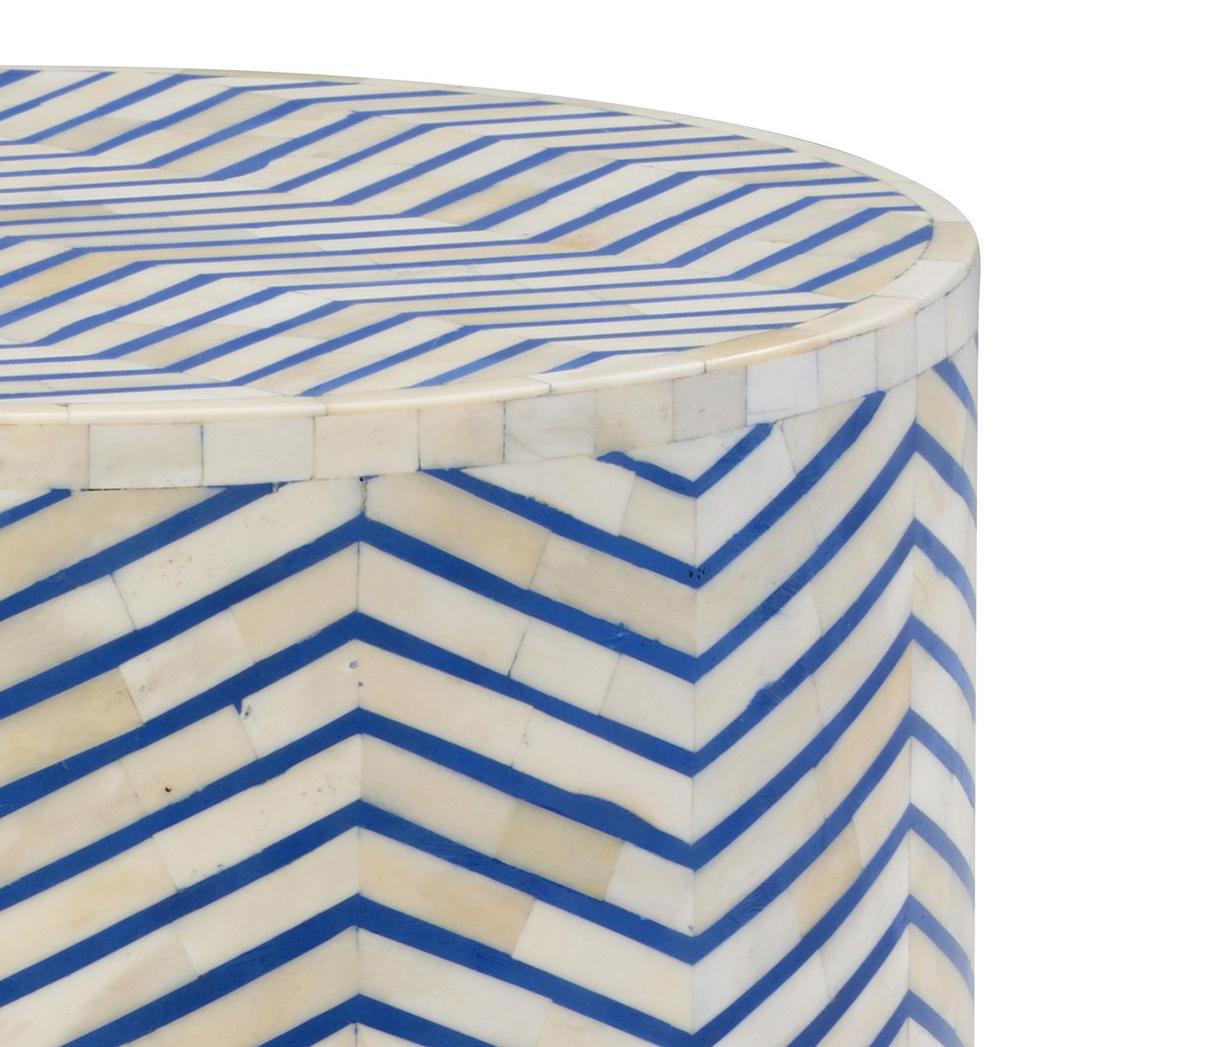 Awe Inspiring Agra Bone Inlay Side Table Side Tables From Pfeifer Studio Download Free Architecture Designs Scobabritishbridgeorg